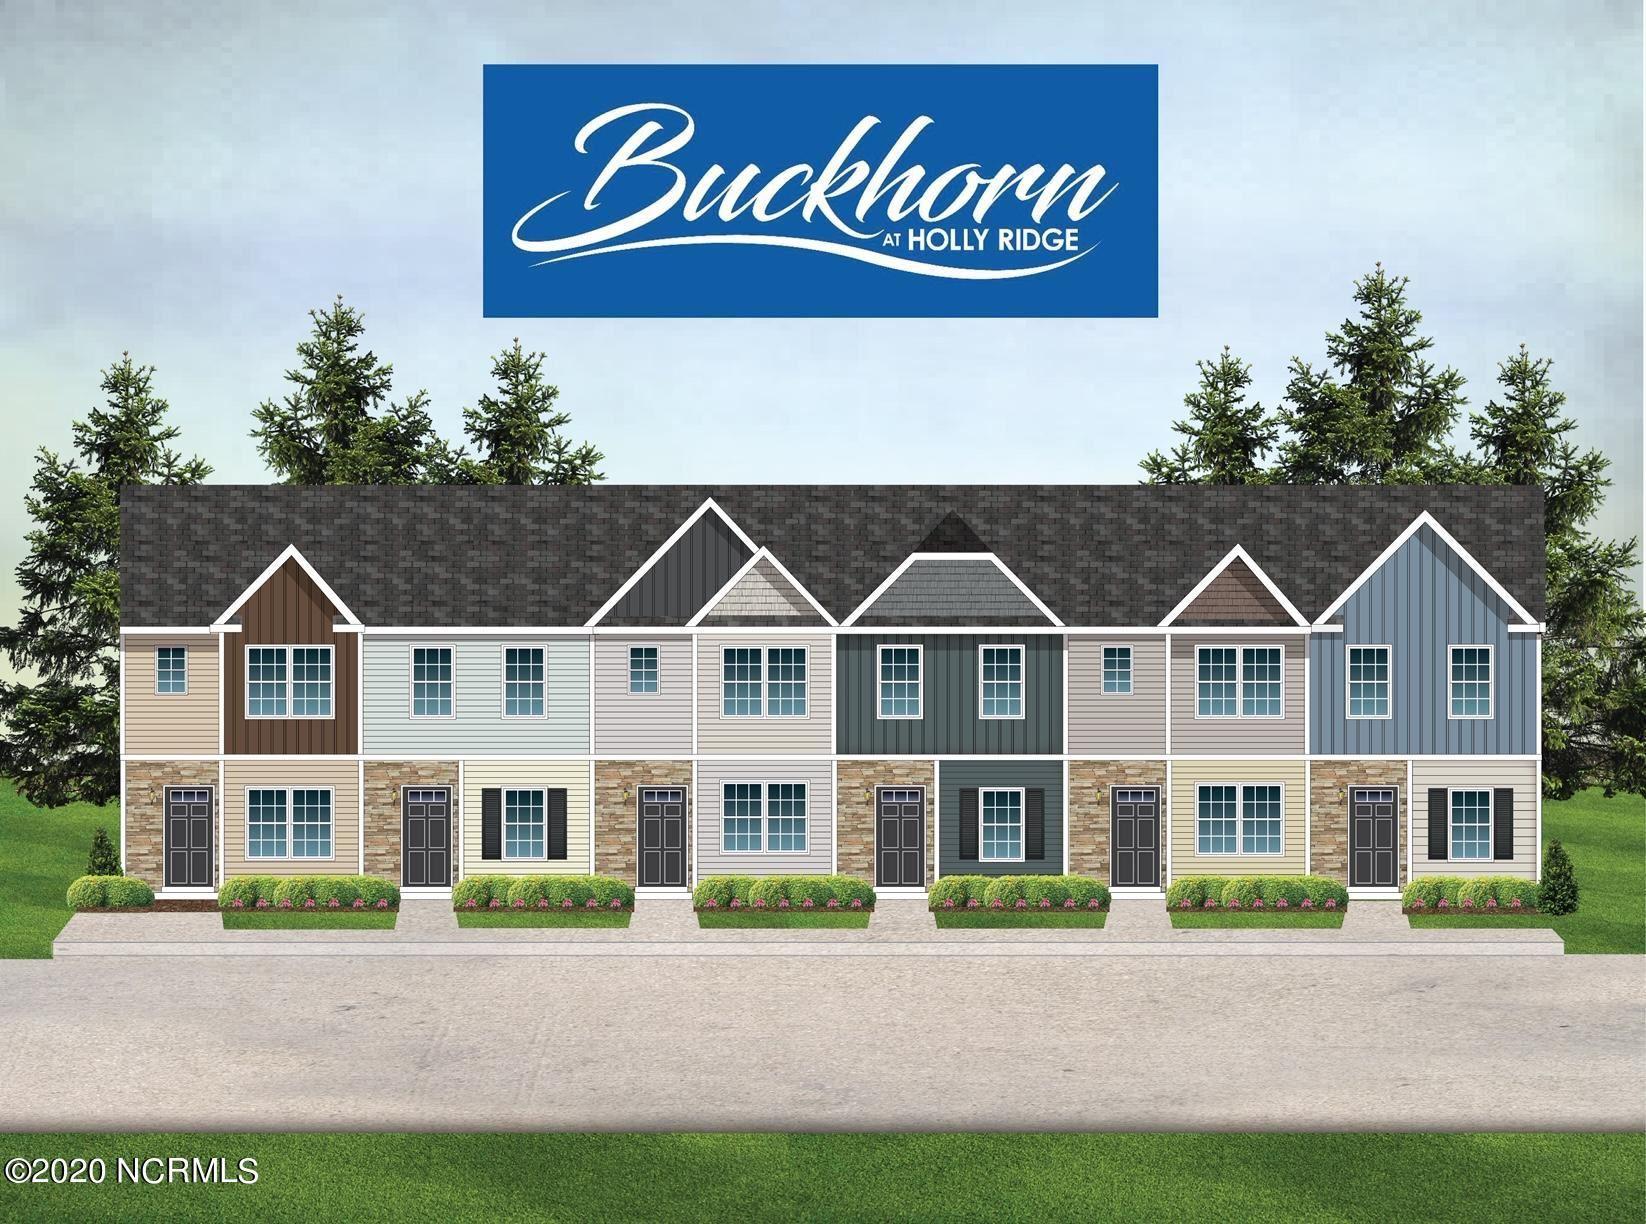 Photo for 155 Buckhorn Avenue, Holly Ridge, NC 28445 (MLS # 100250179)